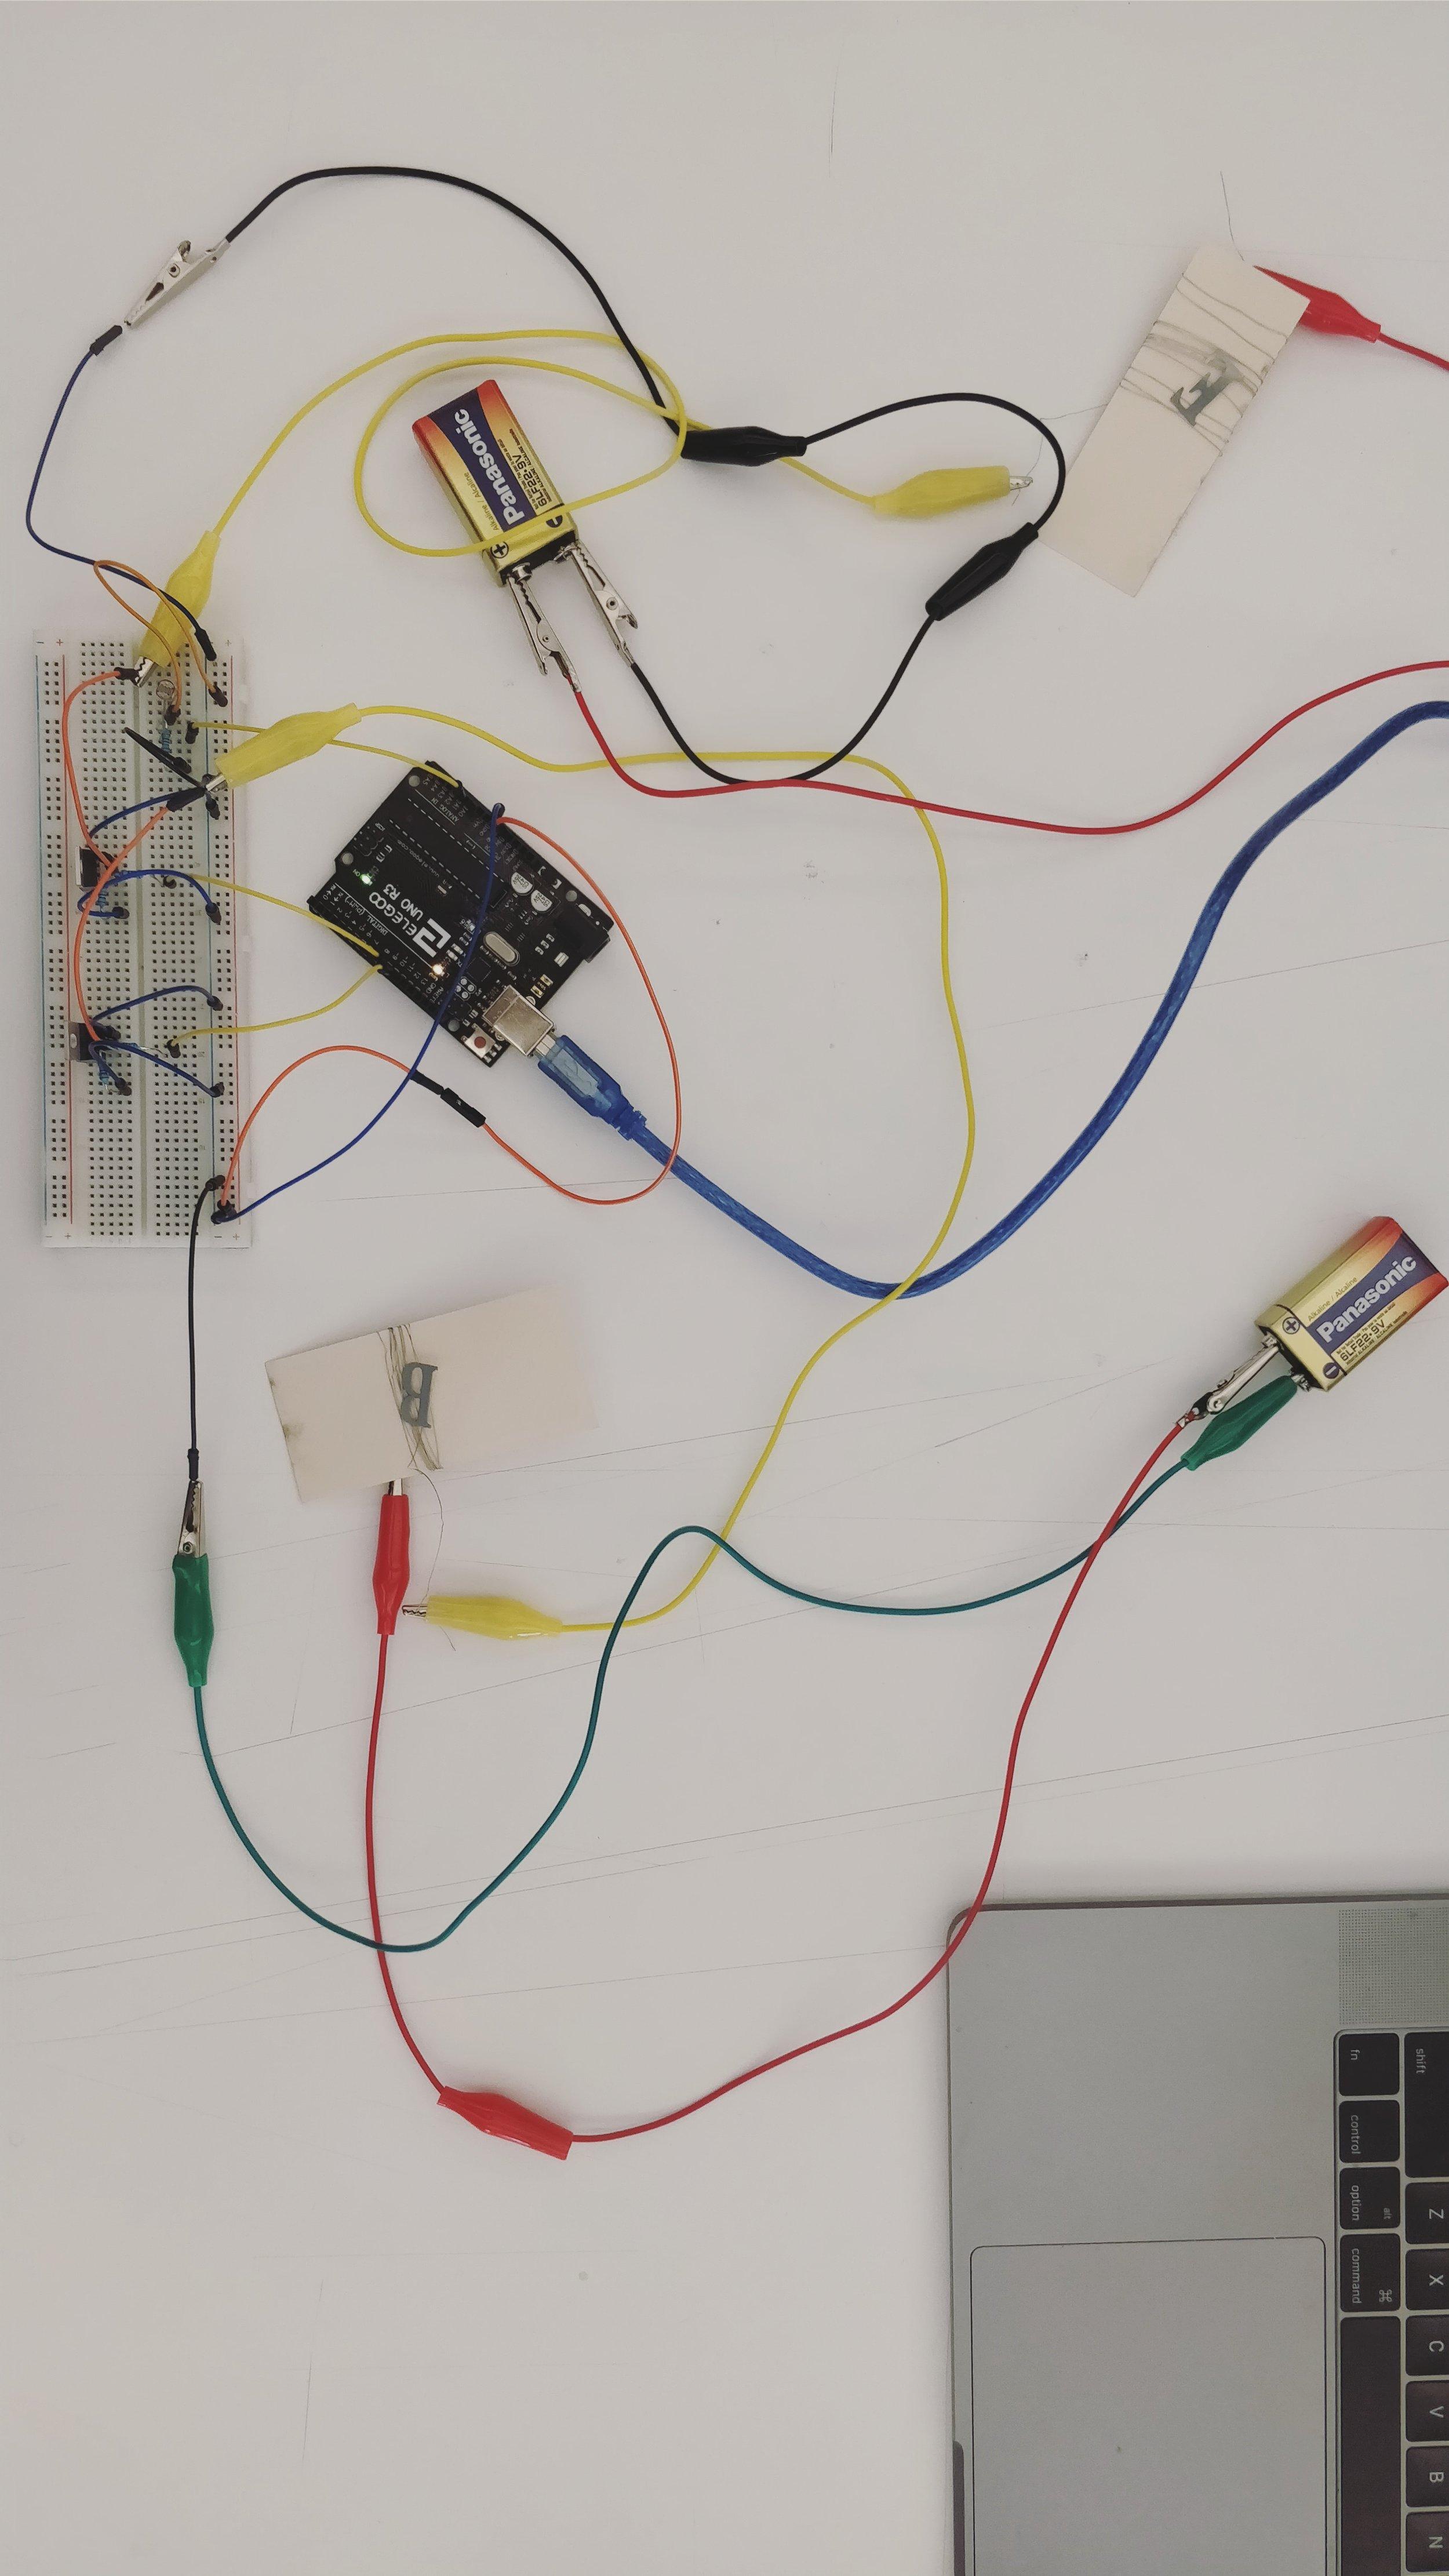 Controlling a high load circuit through the Arduino